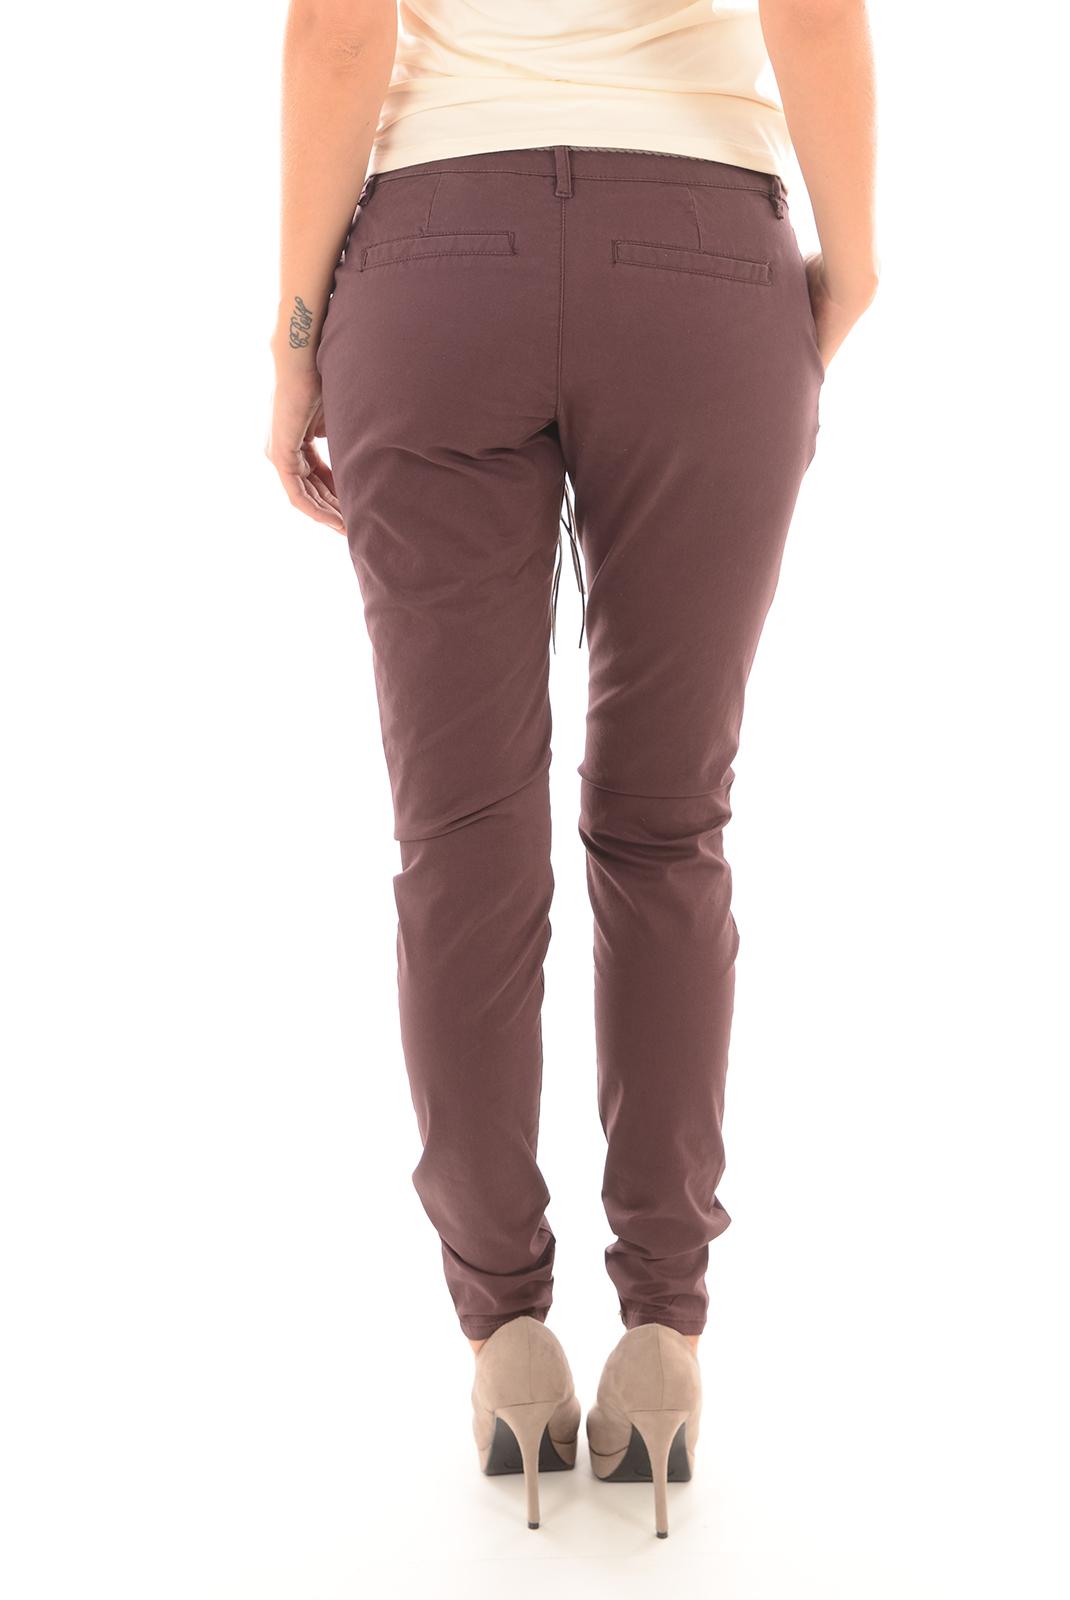 Pantalons  Only GARLAND BELT FUDGE